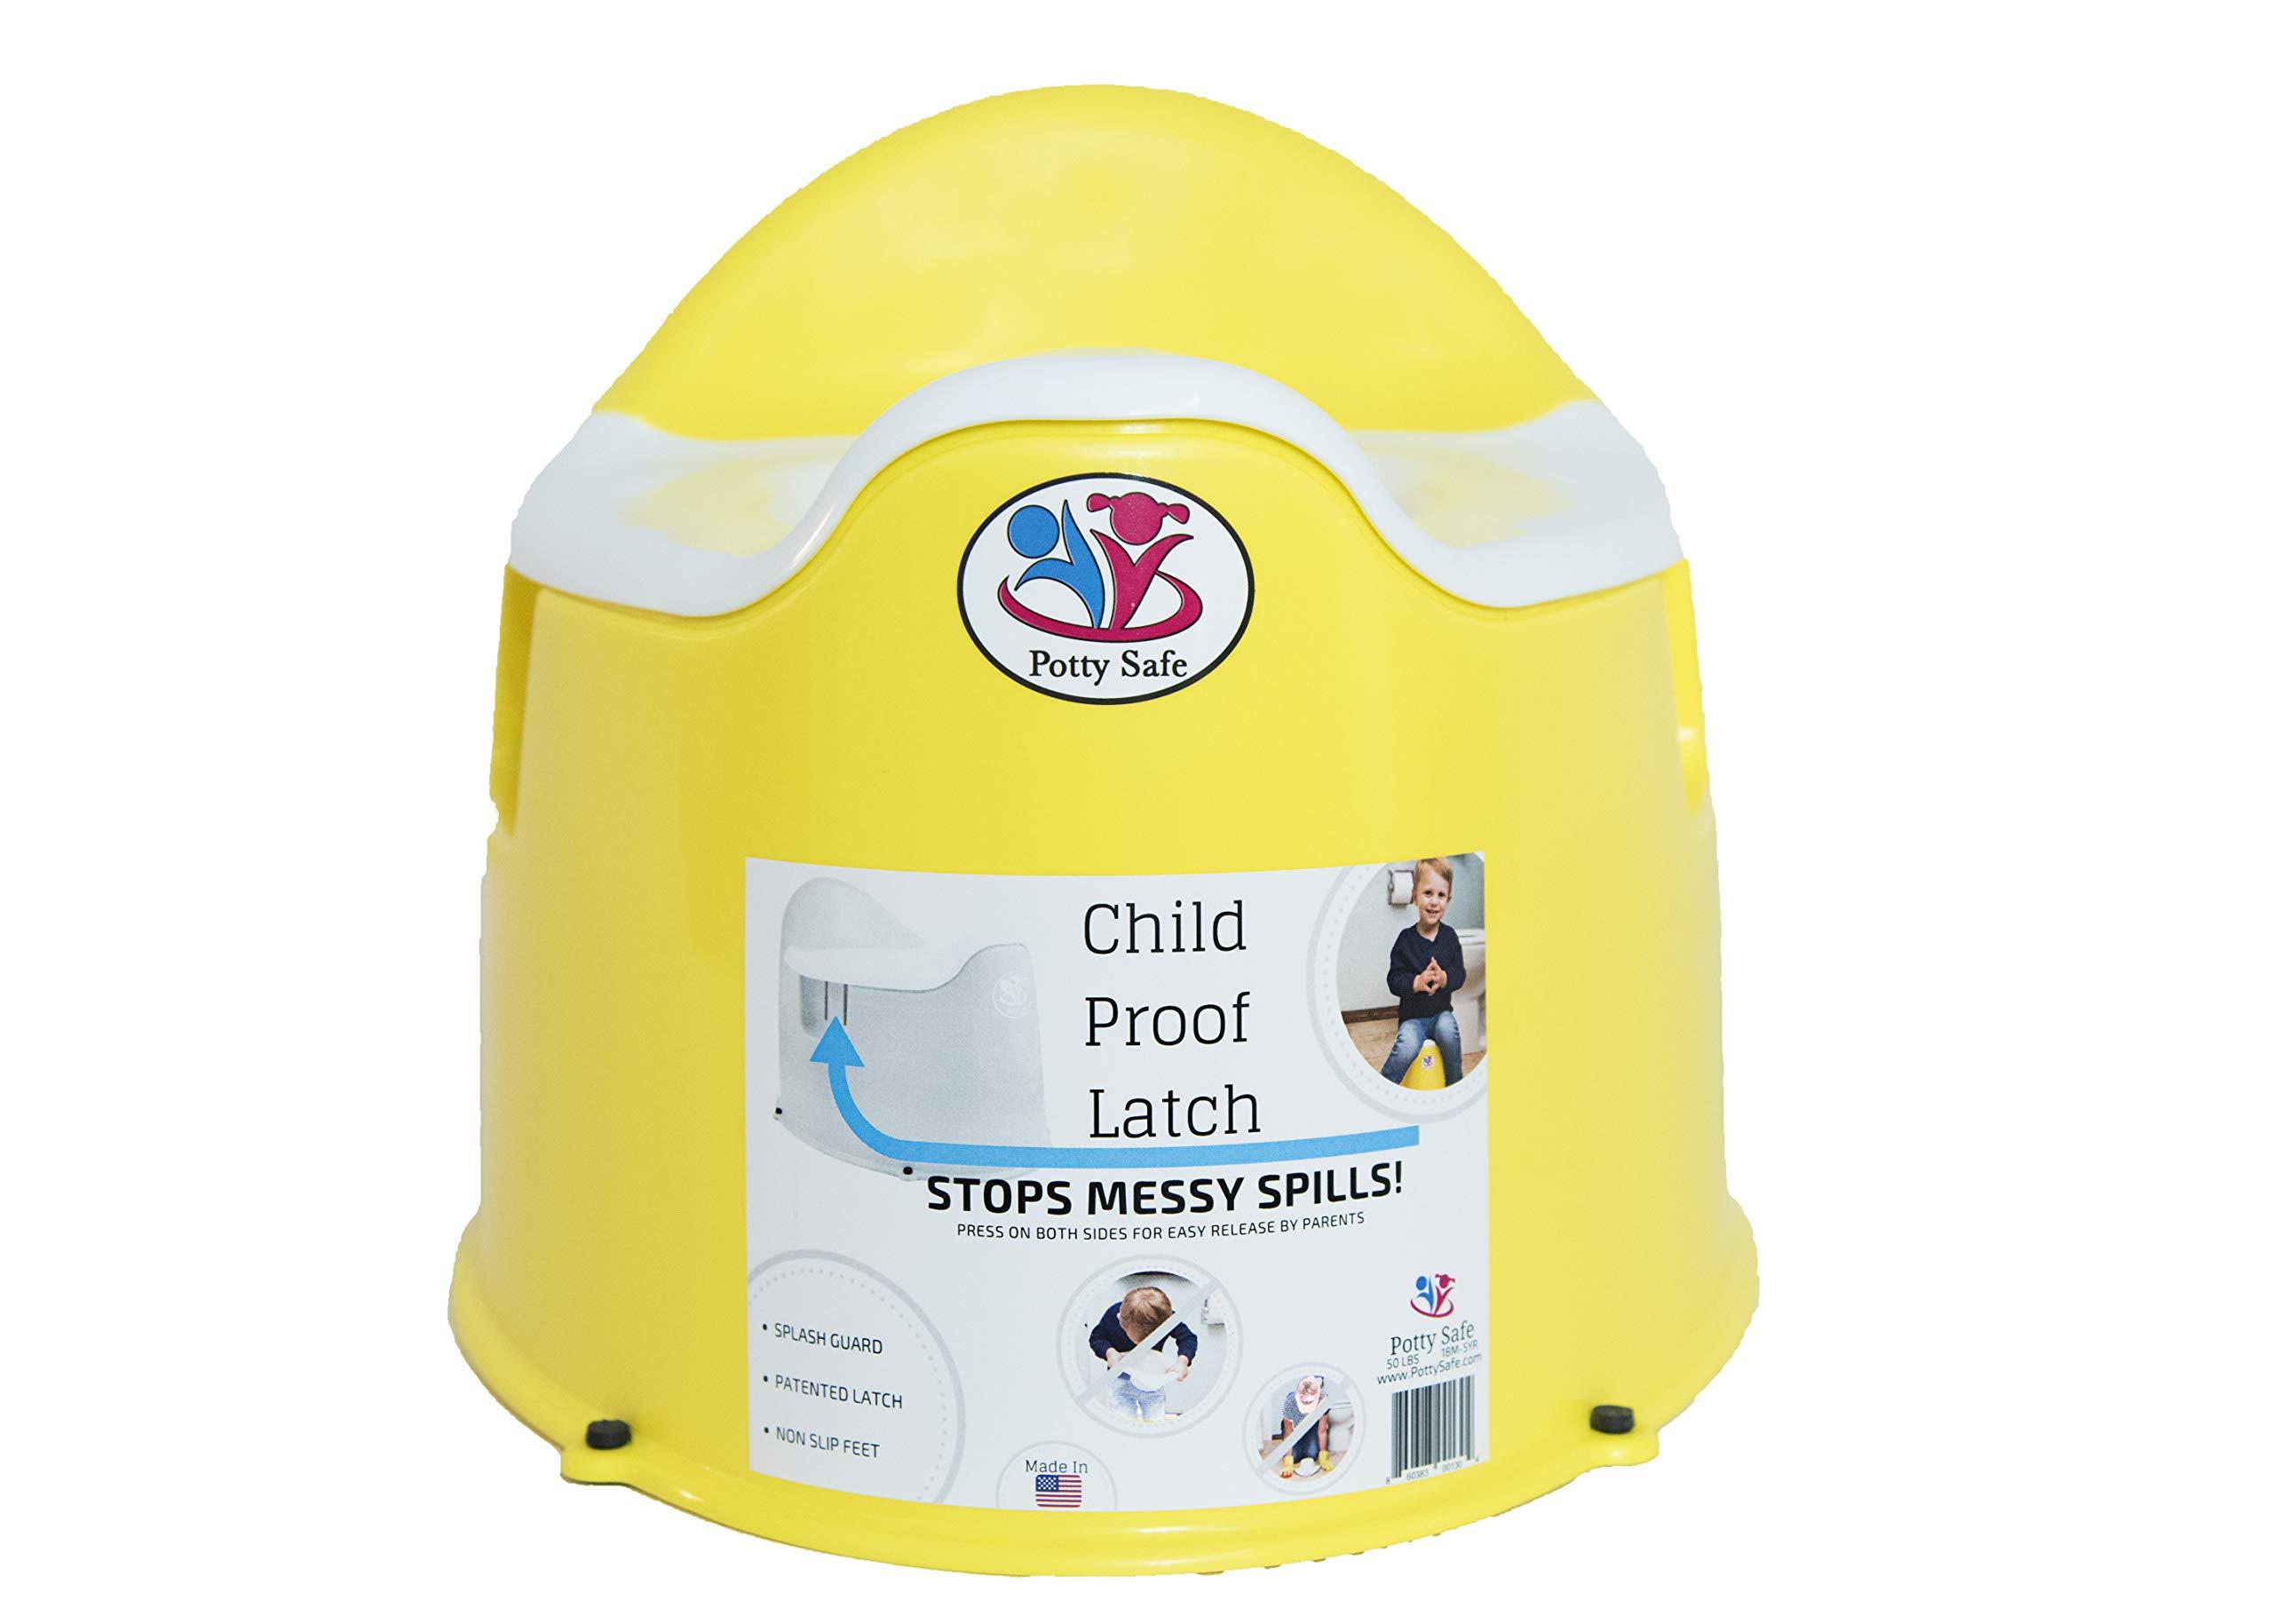 Potty Safe-Potty Training Toilet w/Child Proof Latch; Potty Chair; Training Potty;Potty Training; Toilet Training; Kids Potty Chair; Made in USA; Child Potty Chair; Non Slip feet (Yellow)